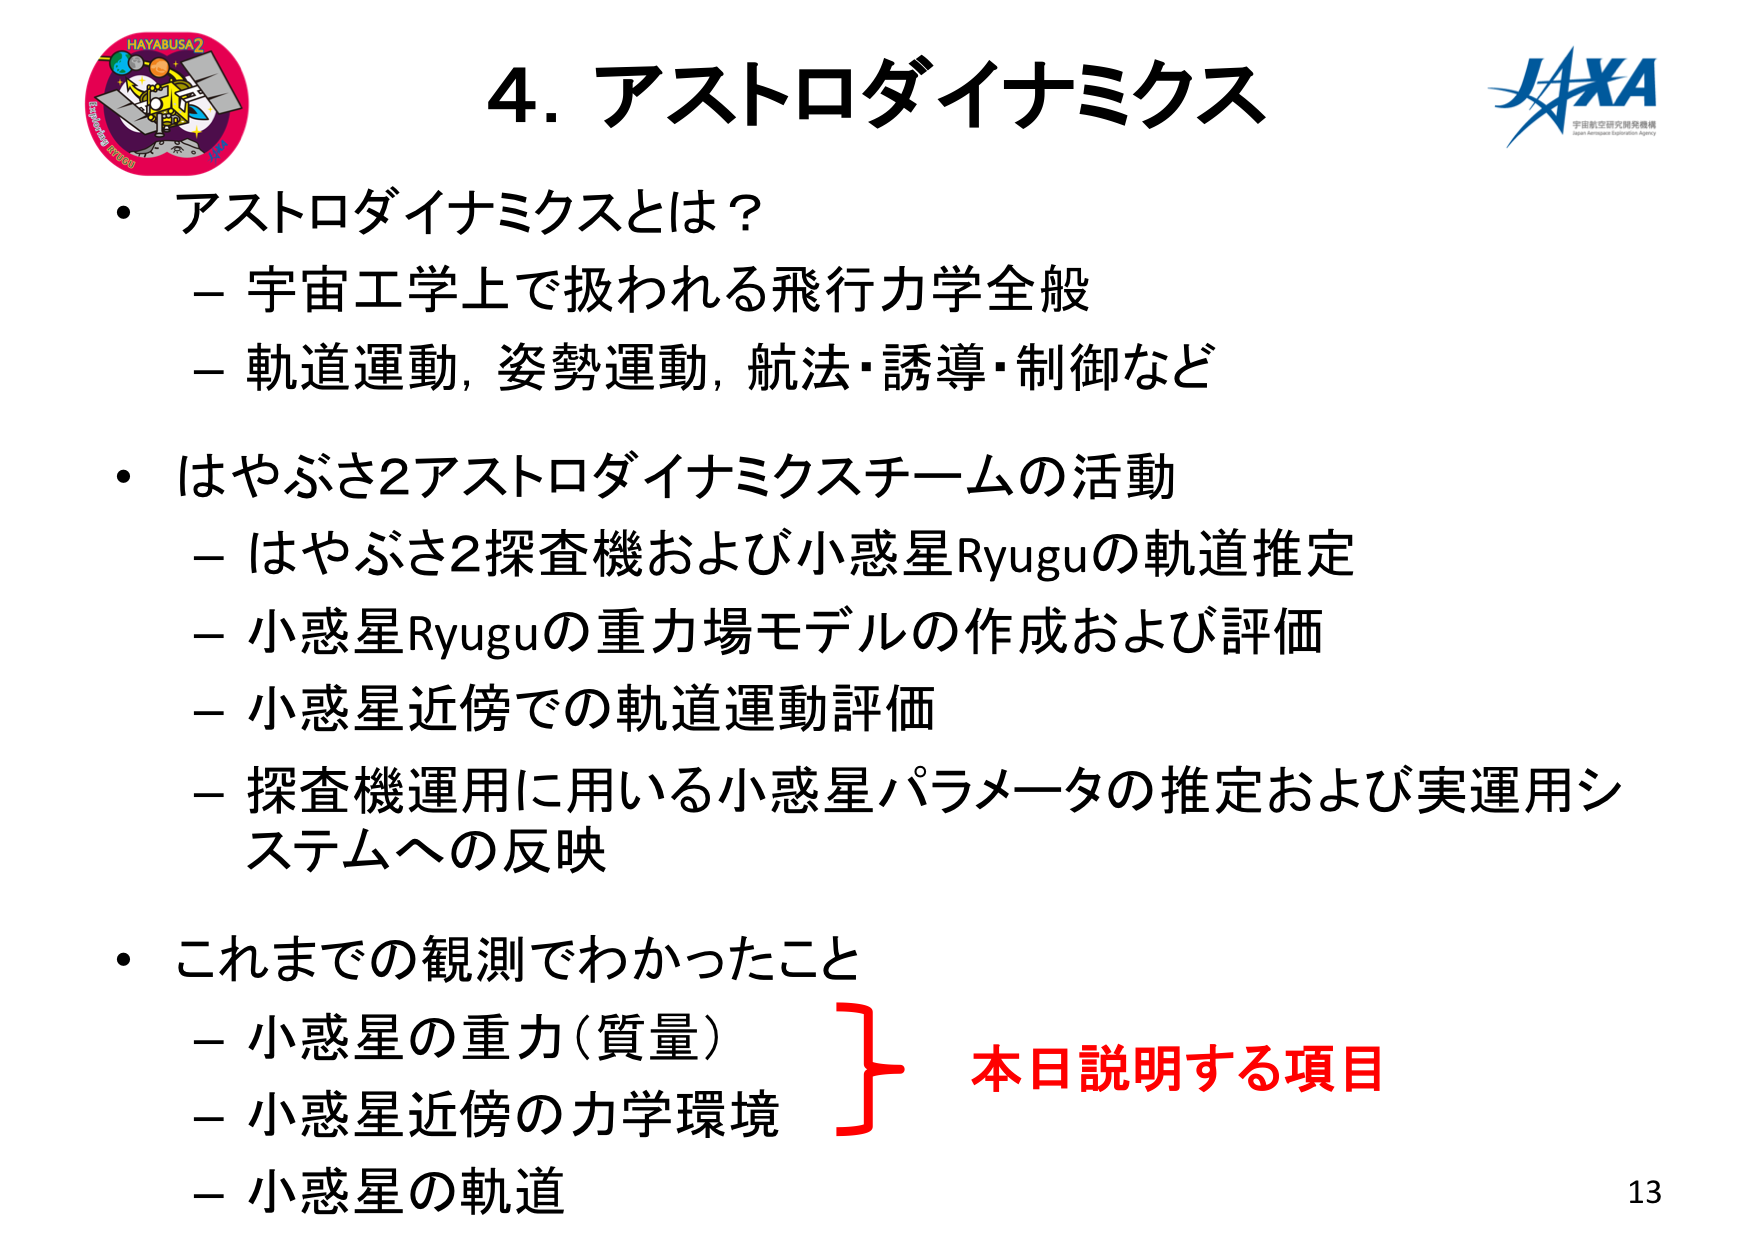 f:id:Imamura:20180905231945p:plain